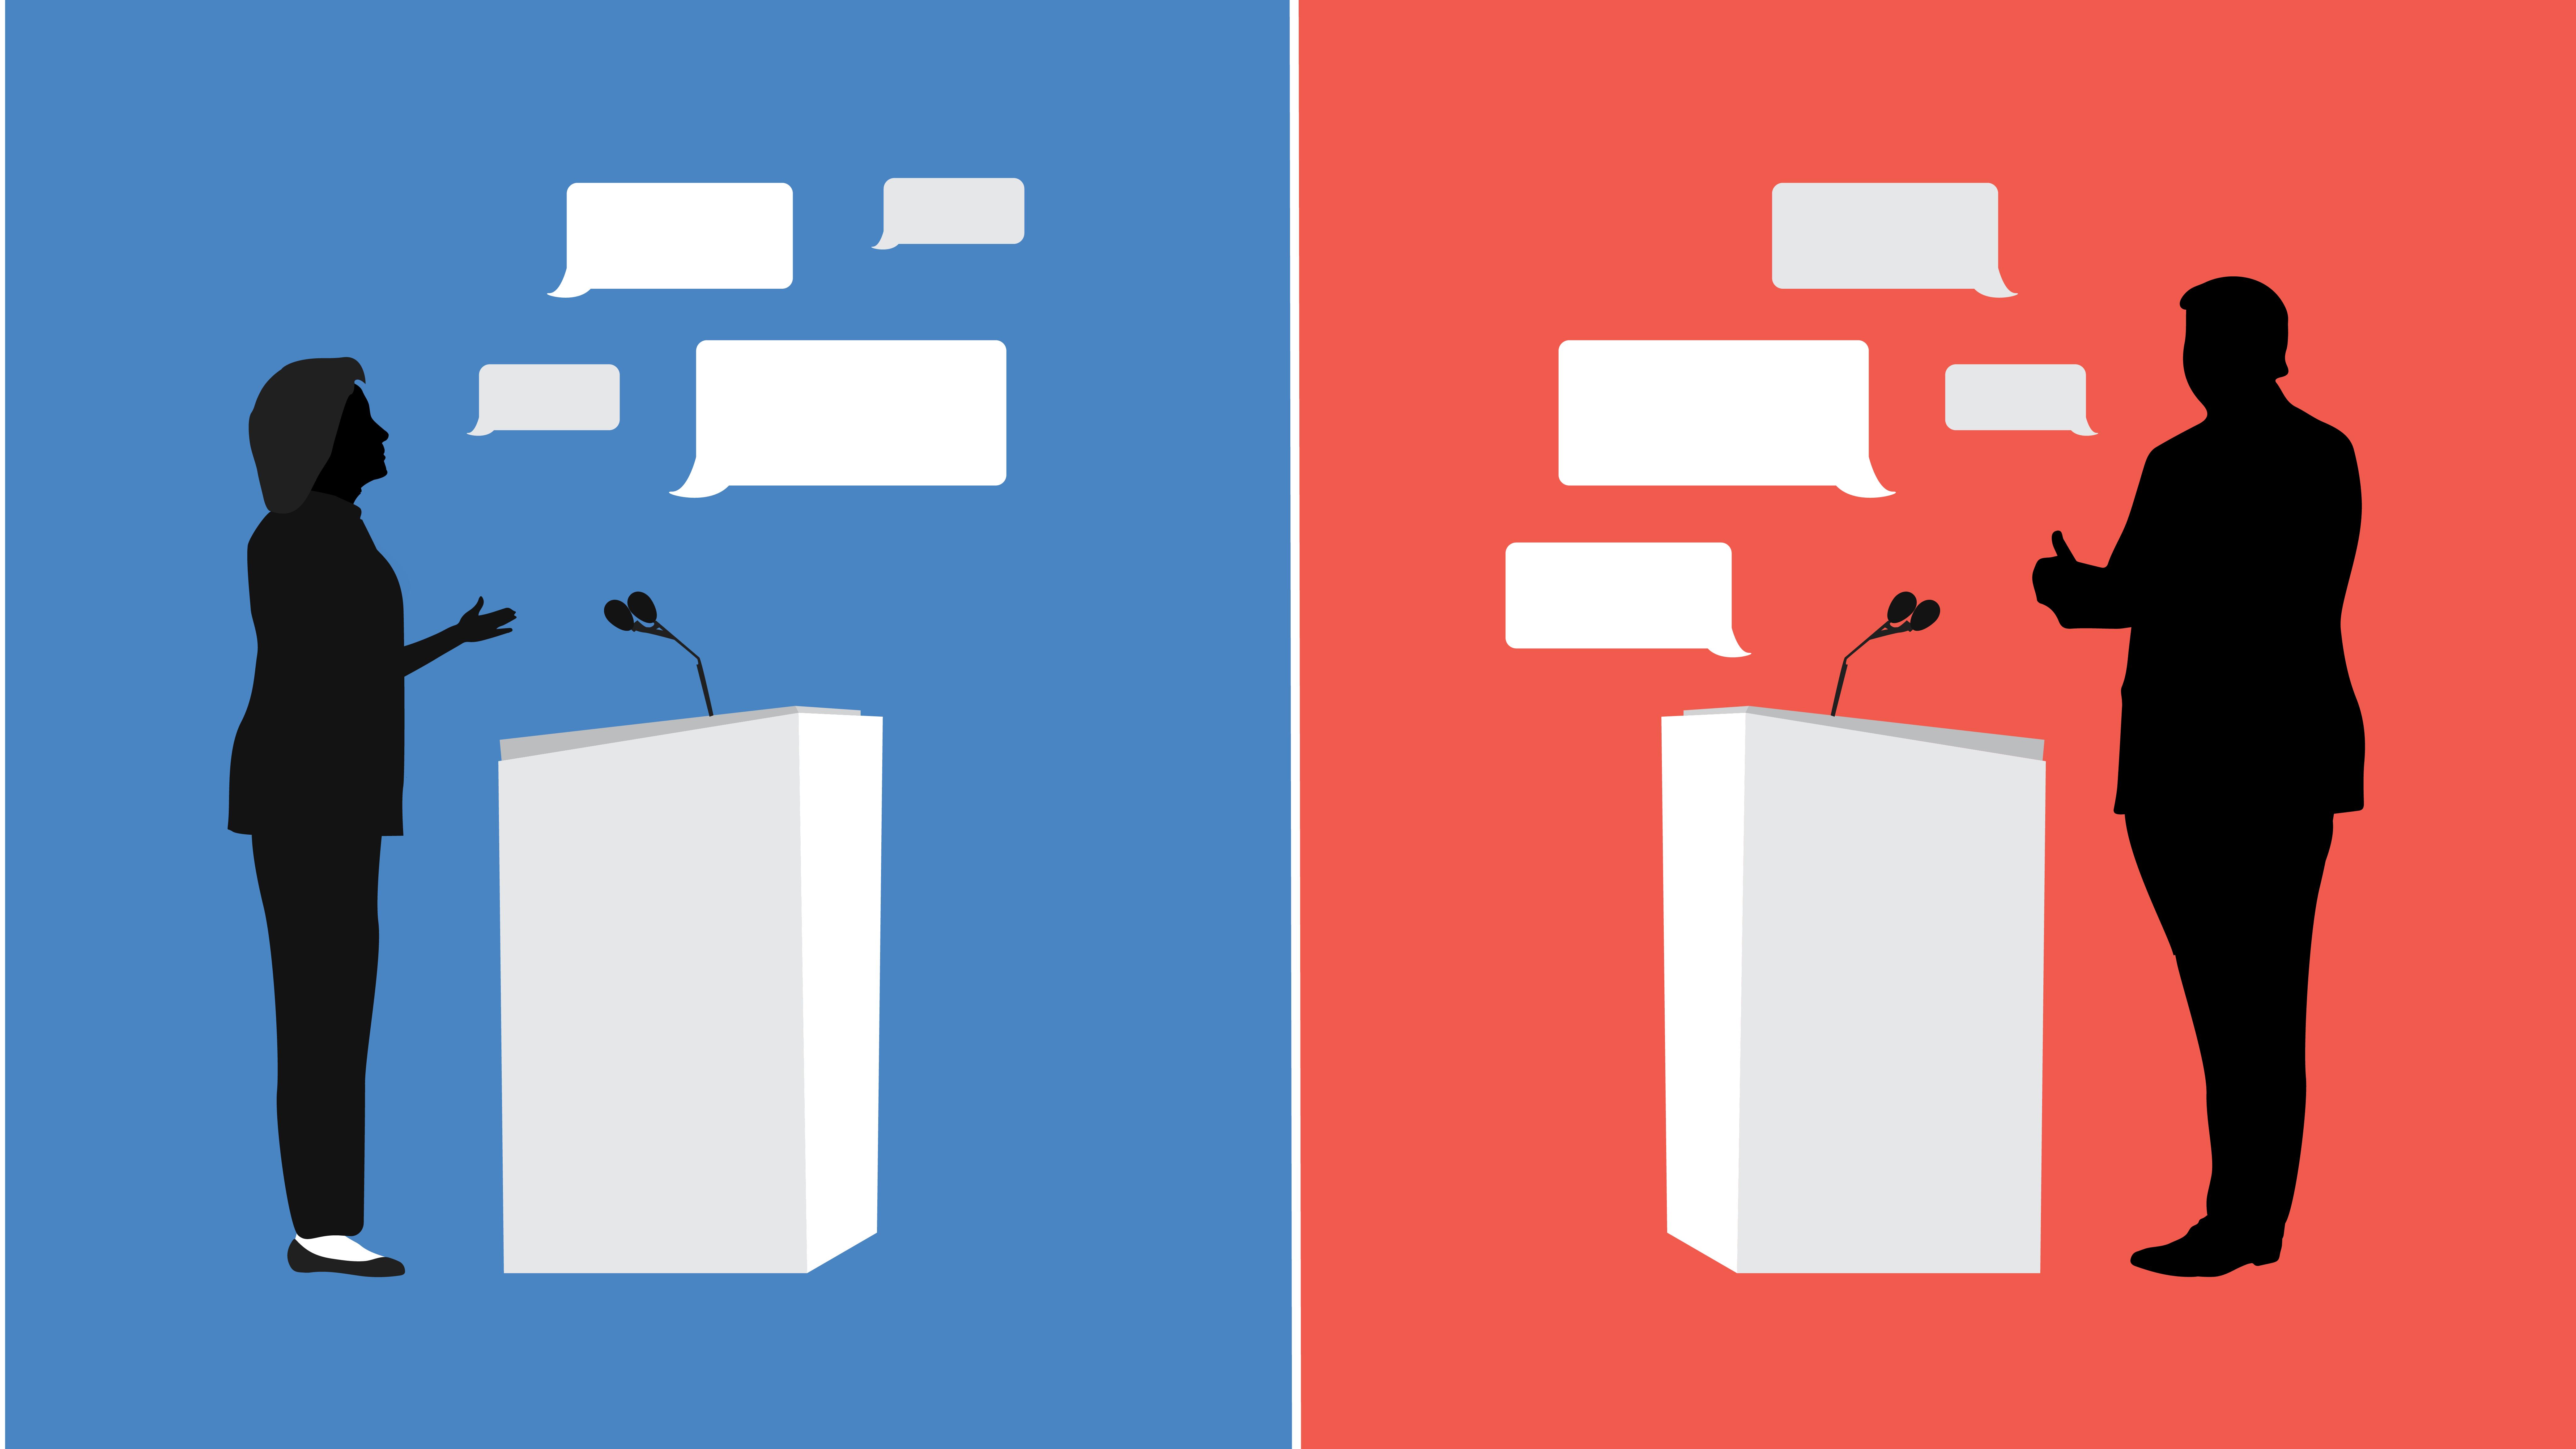 npr.org - FACT CHECK: First Presidential Debate